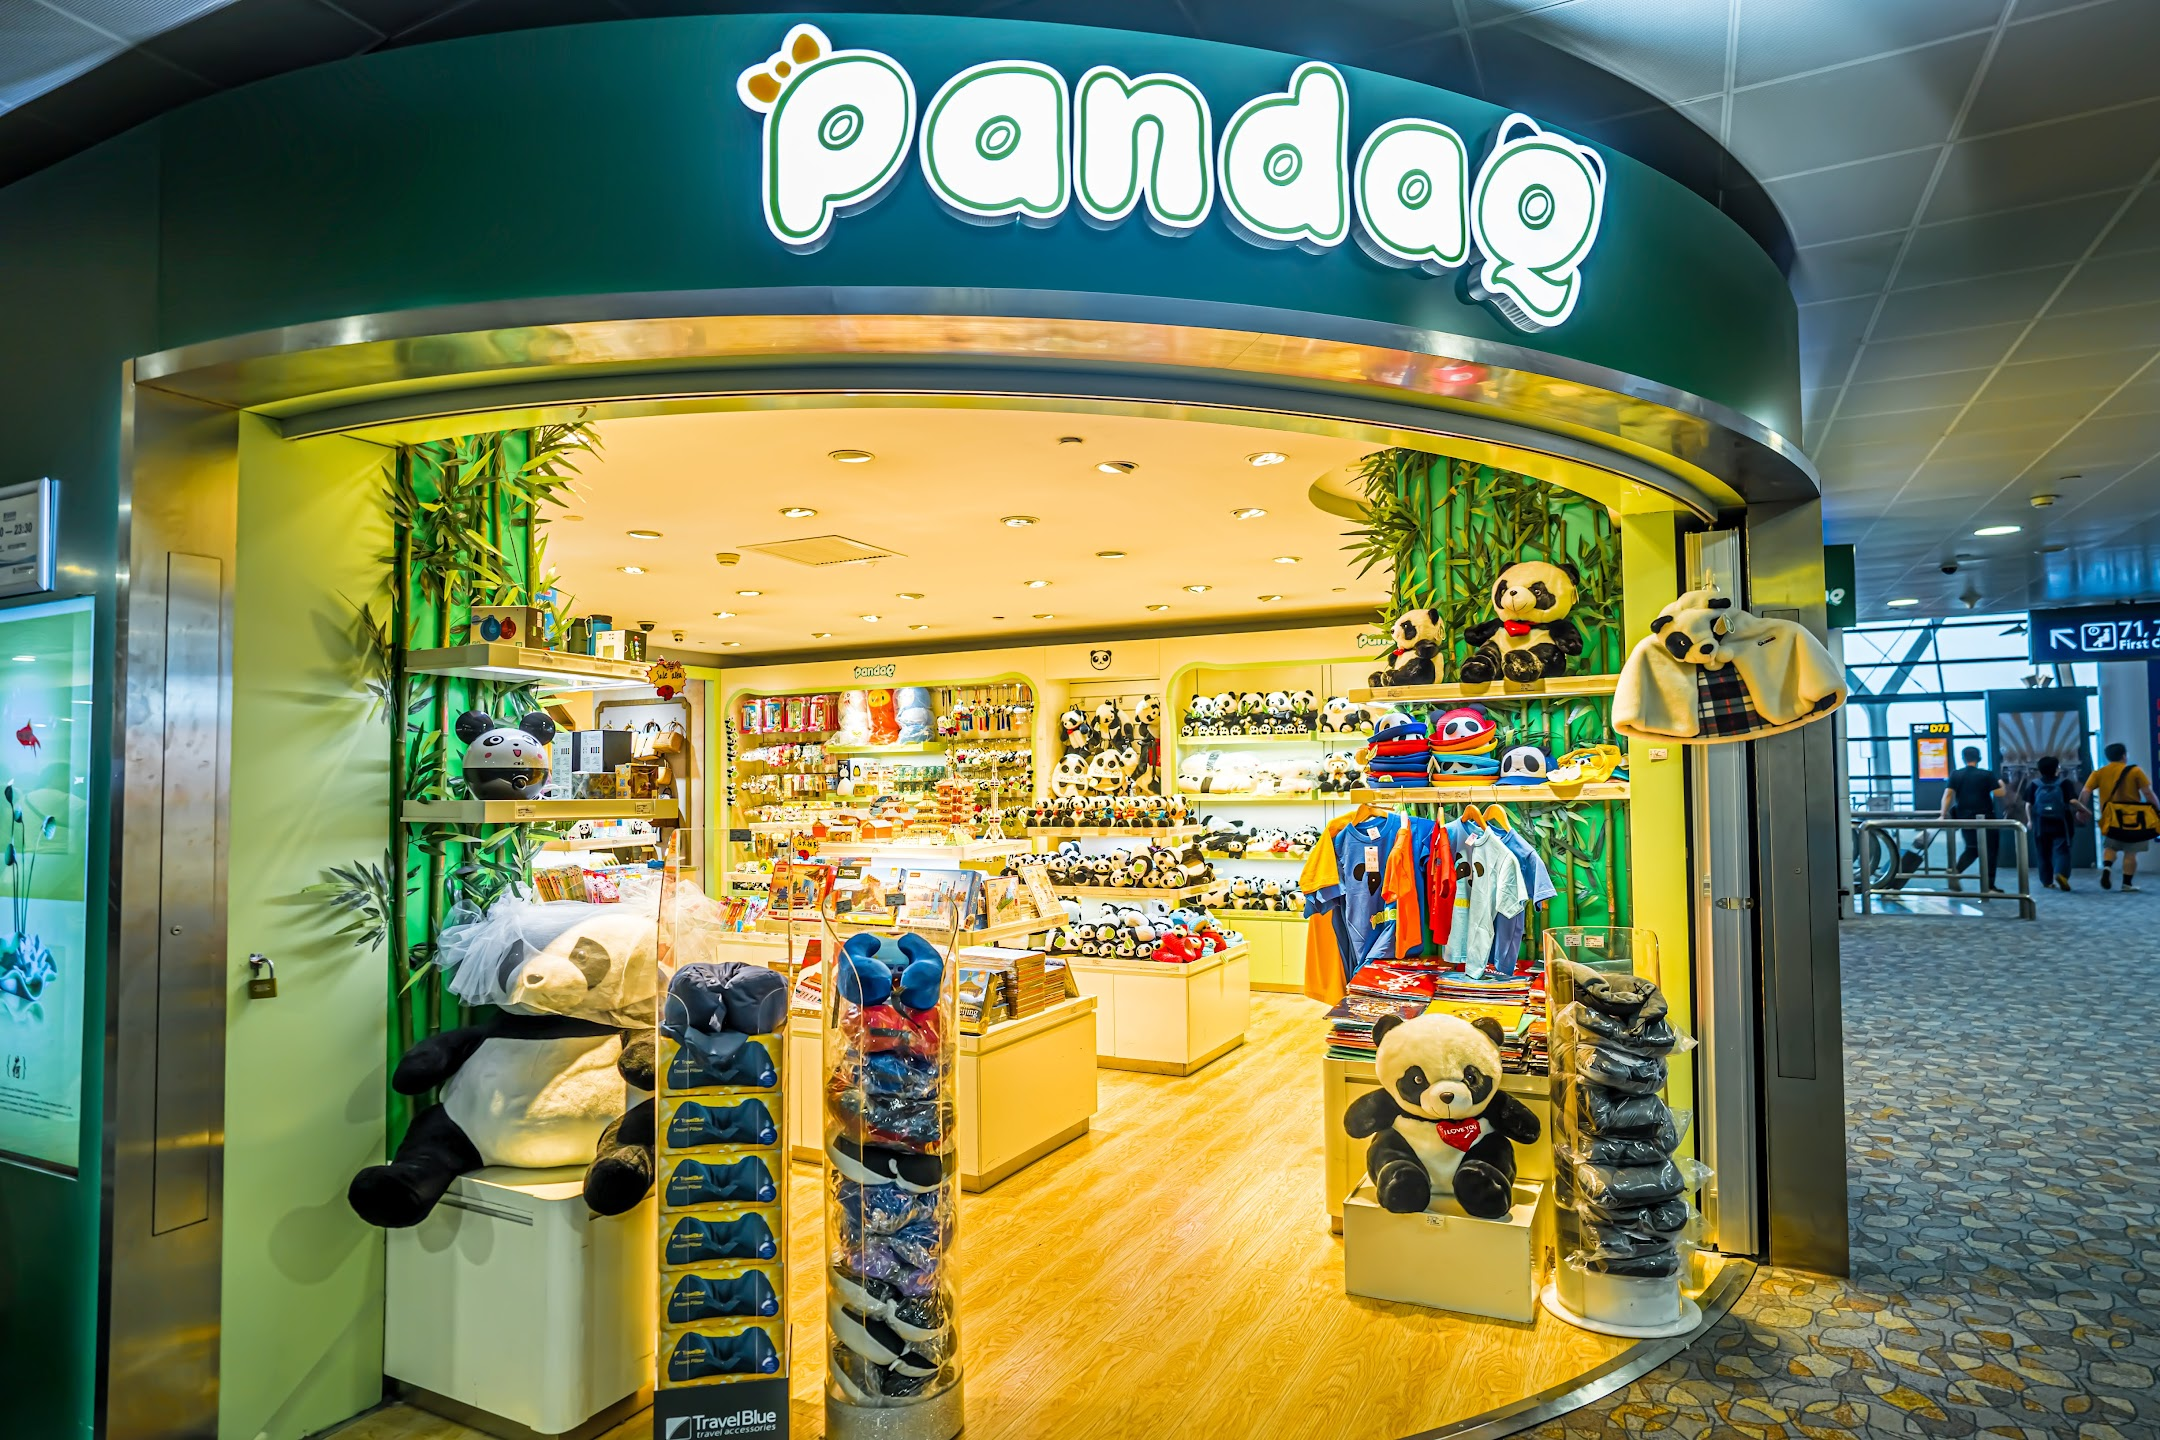 Shanghai Pudong International Airport Panda1